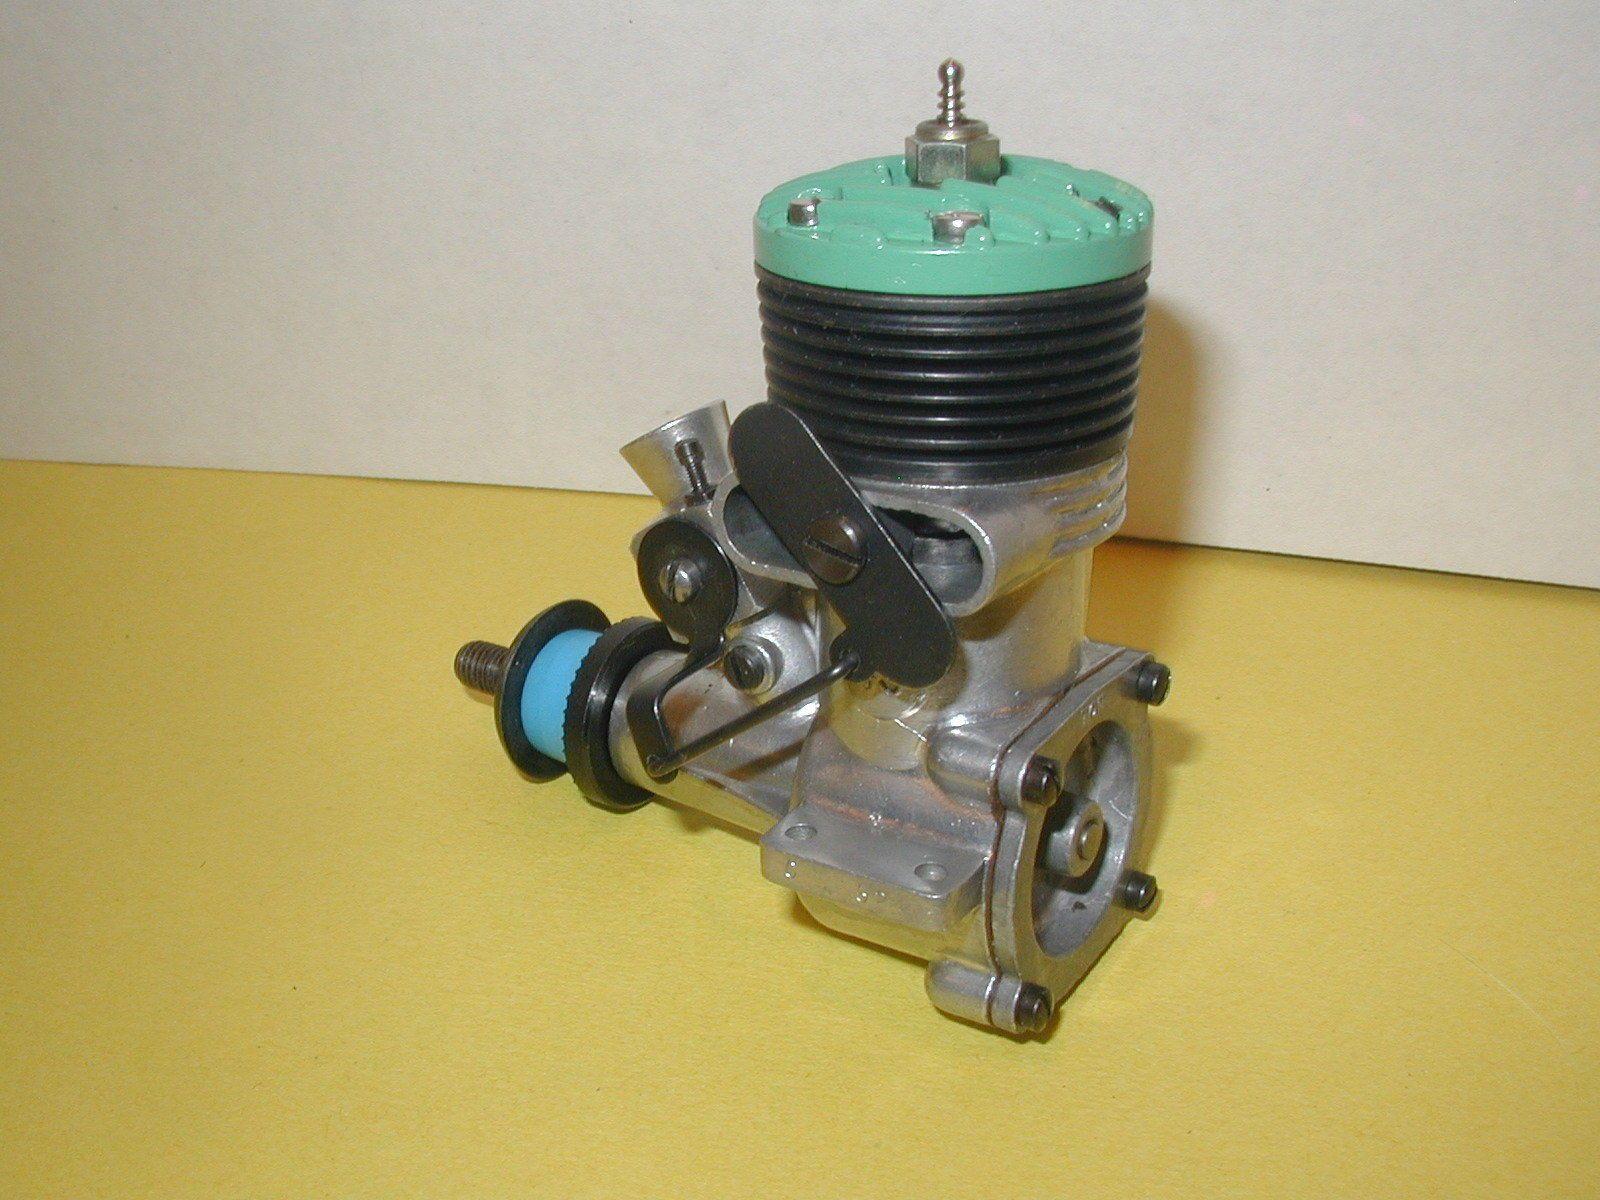 Kb Green Head Torpedo 45 R C Model Airplane Engine Ebay Ford Tractor 3600 Wiring Harness K B